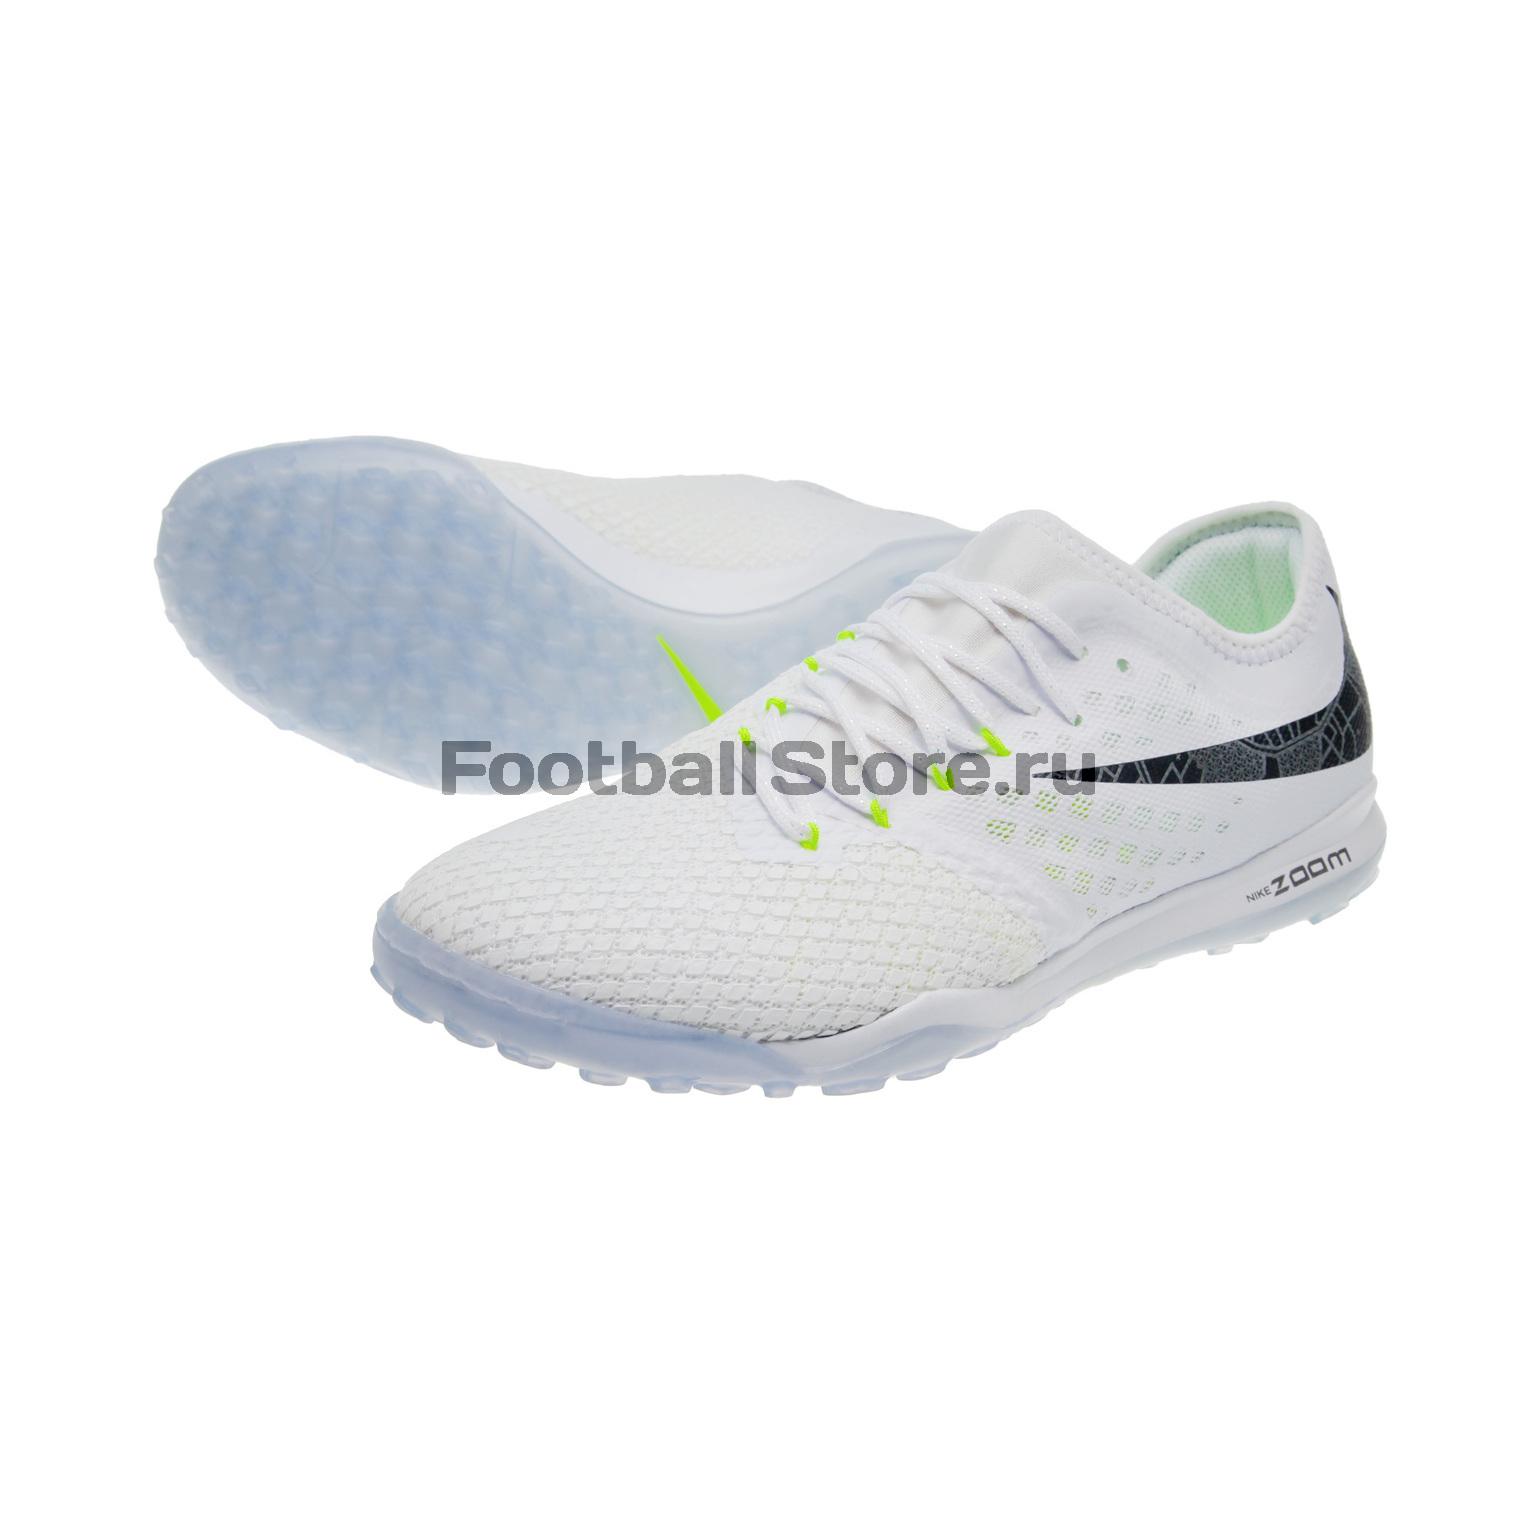 Шиповки Nike Hypervenom Zoom 3 Pro TF AJ3817-107 шиповки nike vaporx 12 pro tf ah7388 810